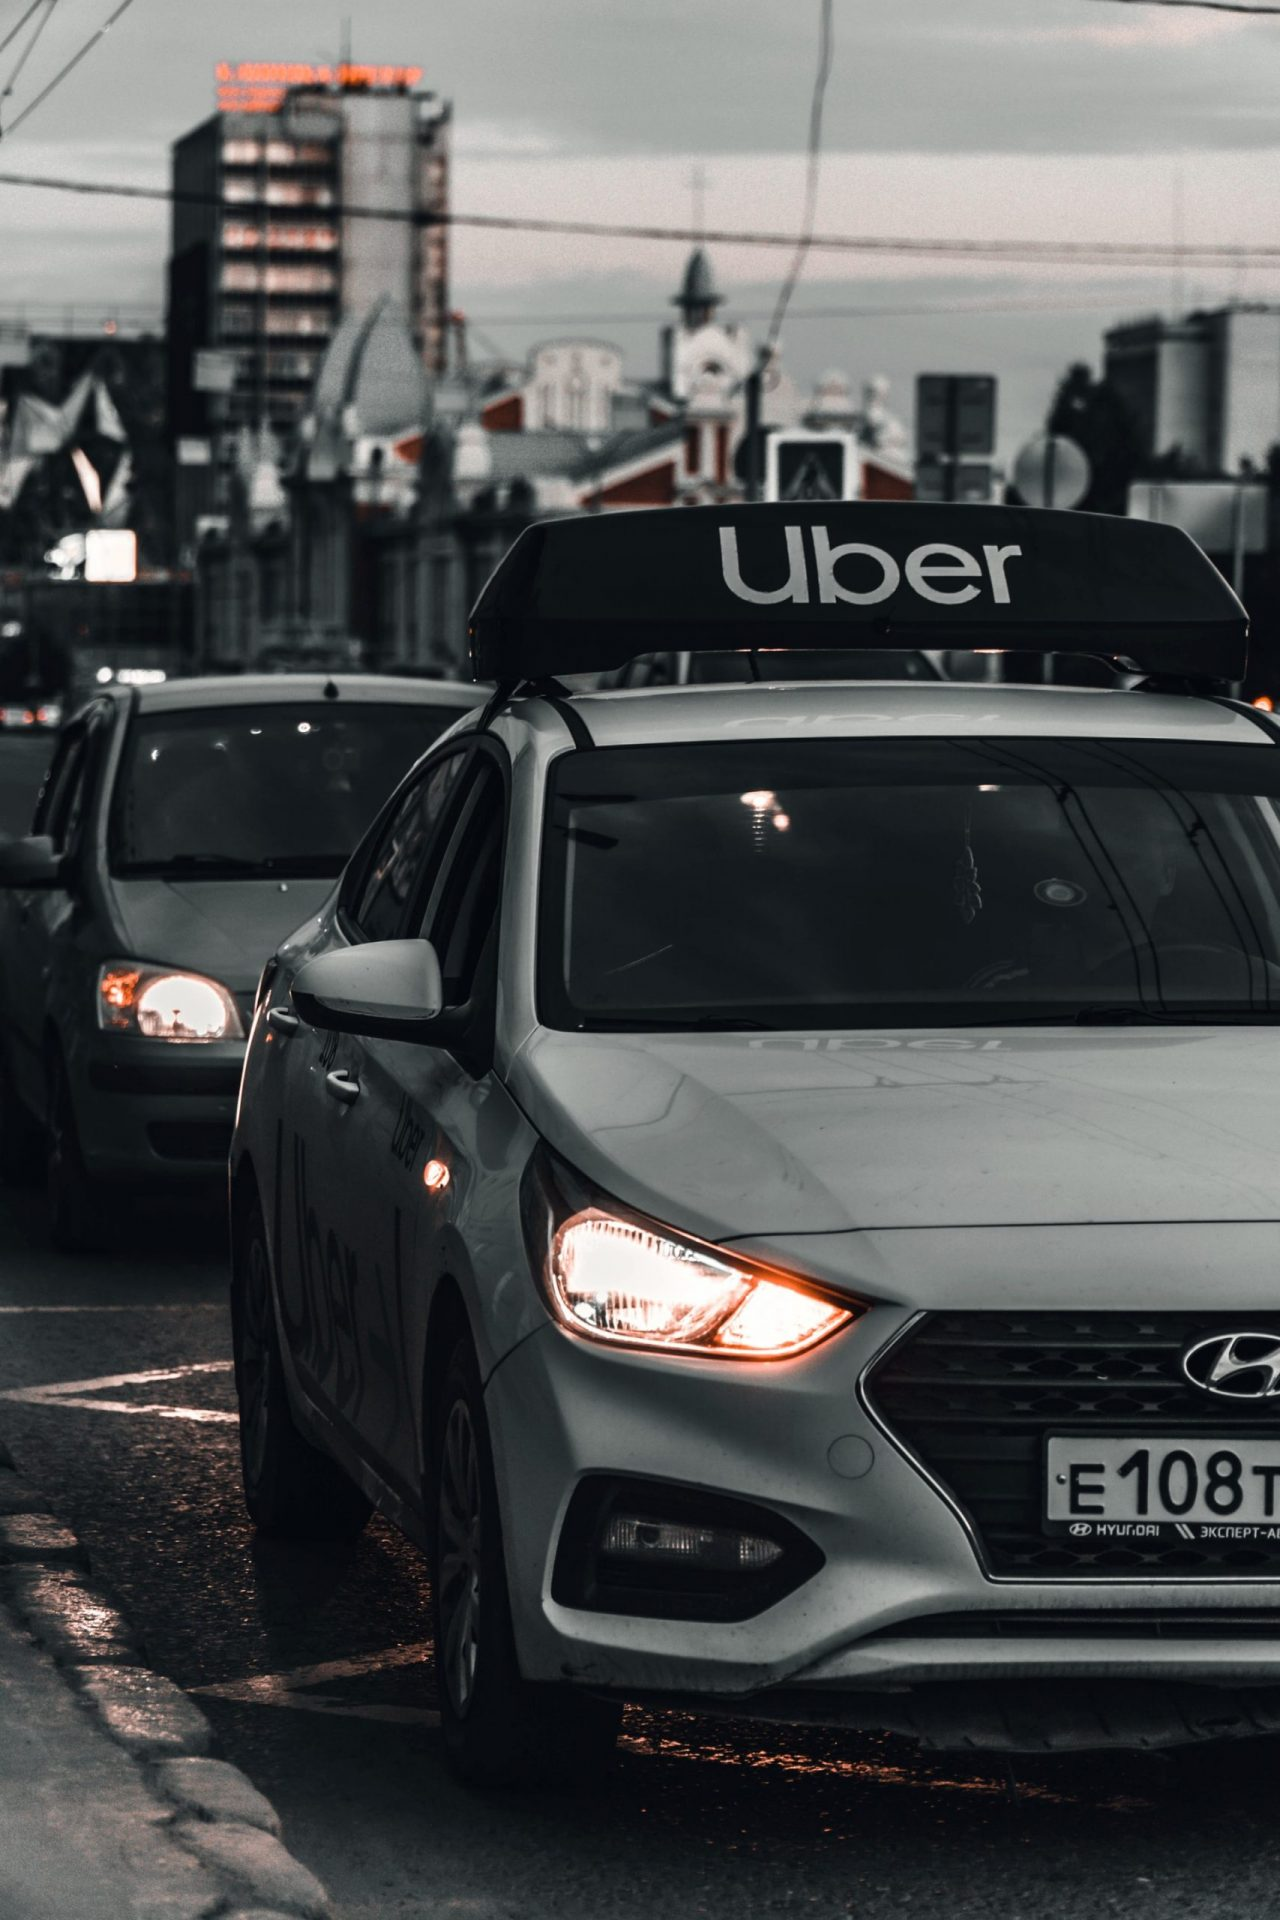 Uber ride share